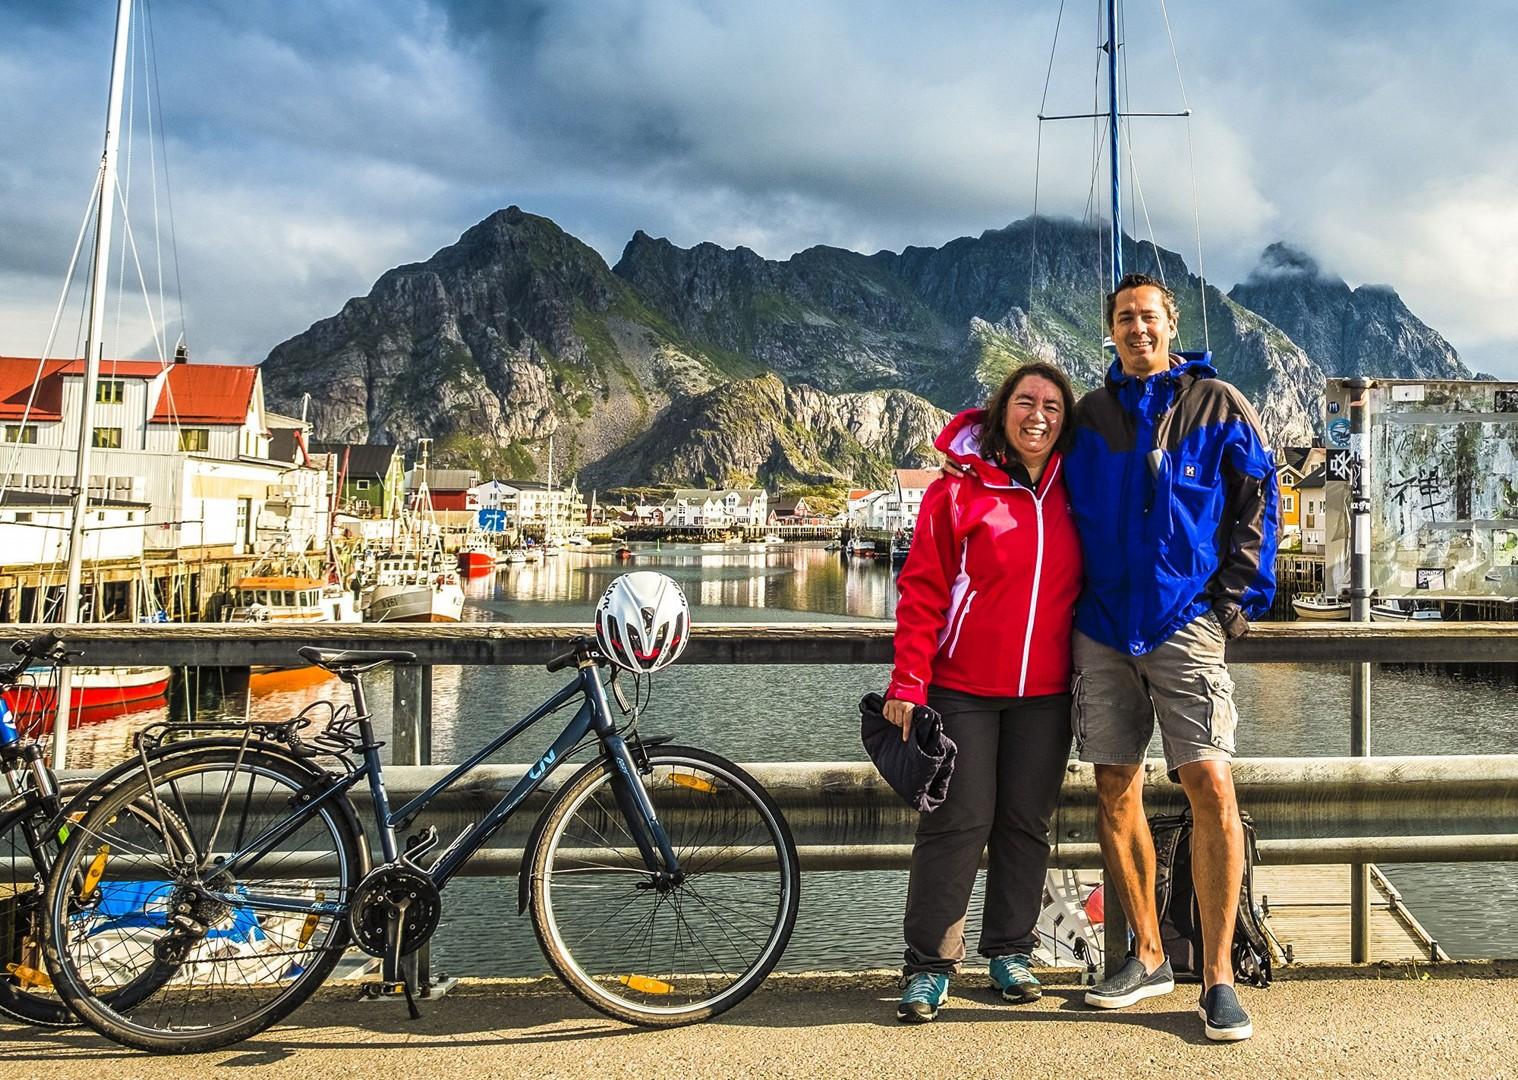 norwegian-fishing-harbours-happy-cyclists-leisure-lofoten-islands-sea.jpg - Norway - Lofoten Islands - Self-Guided Leisure Cycling Holiday - Leisure Cycling